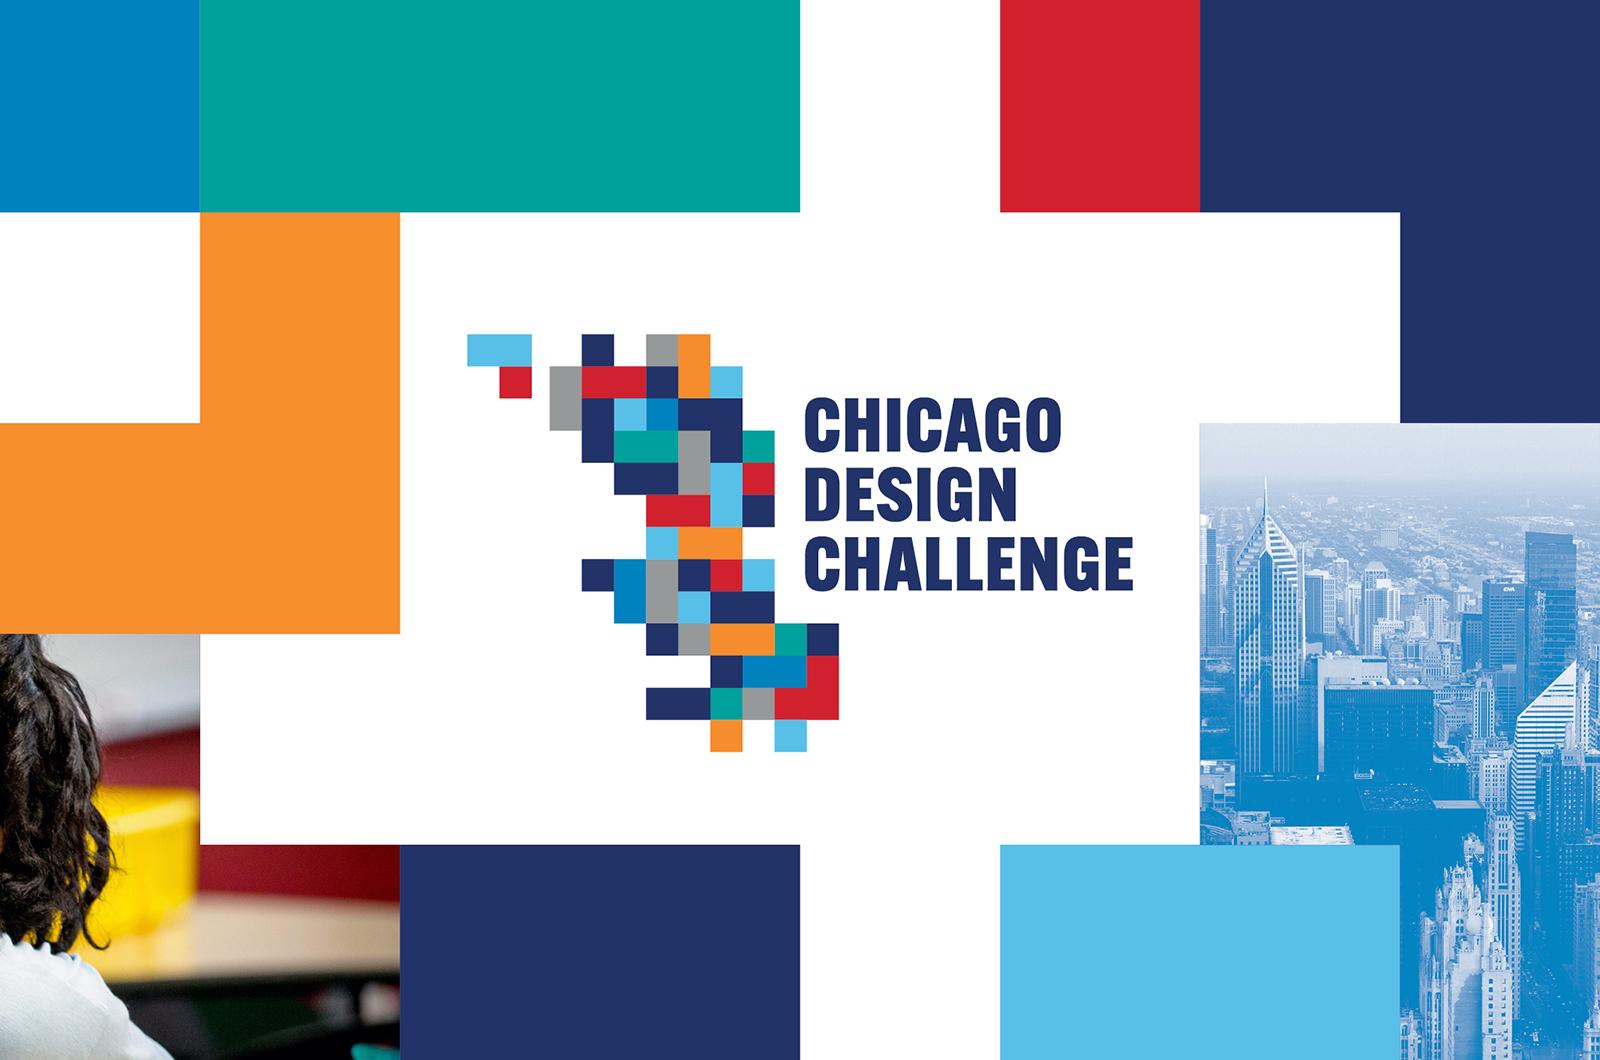 Chicago Design Challenge Identity Image